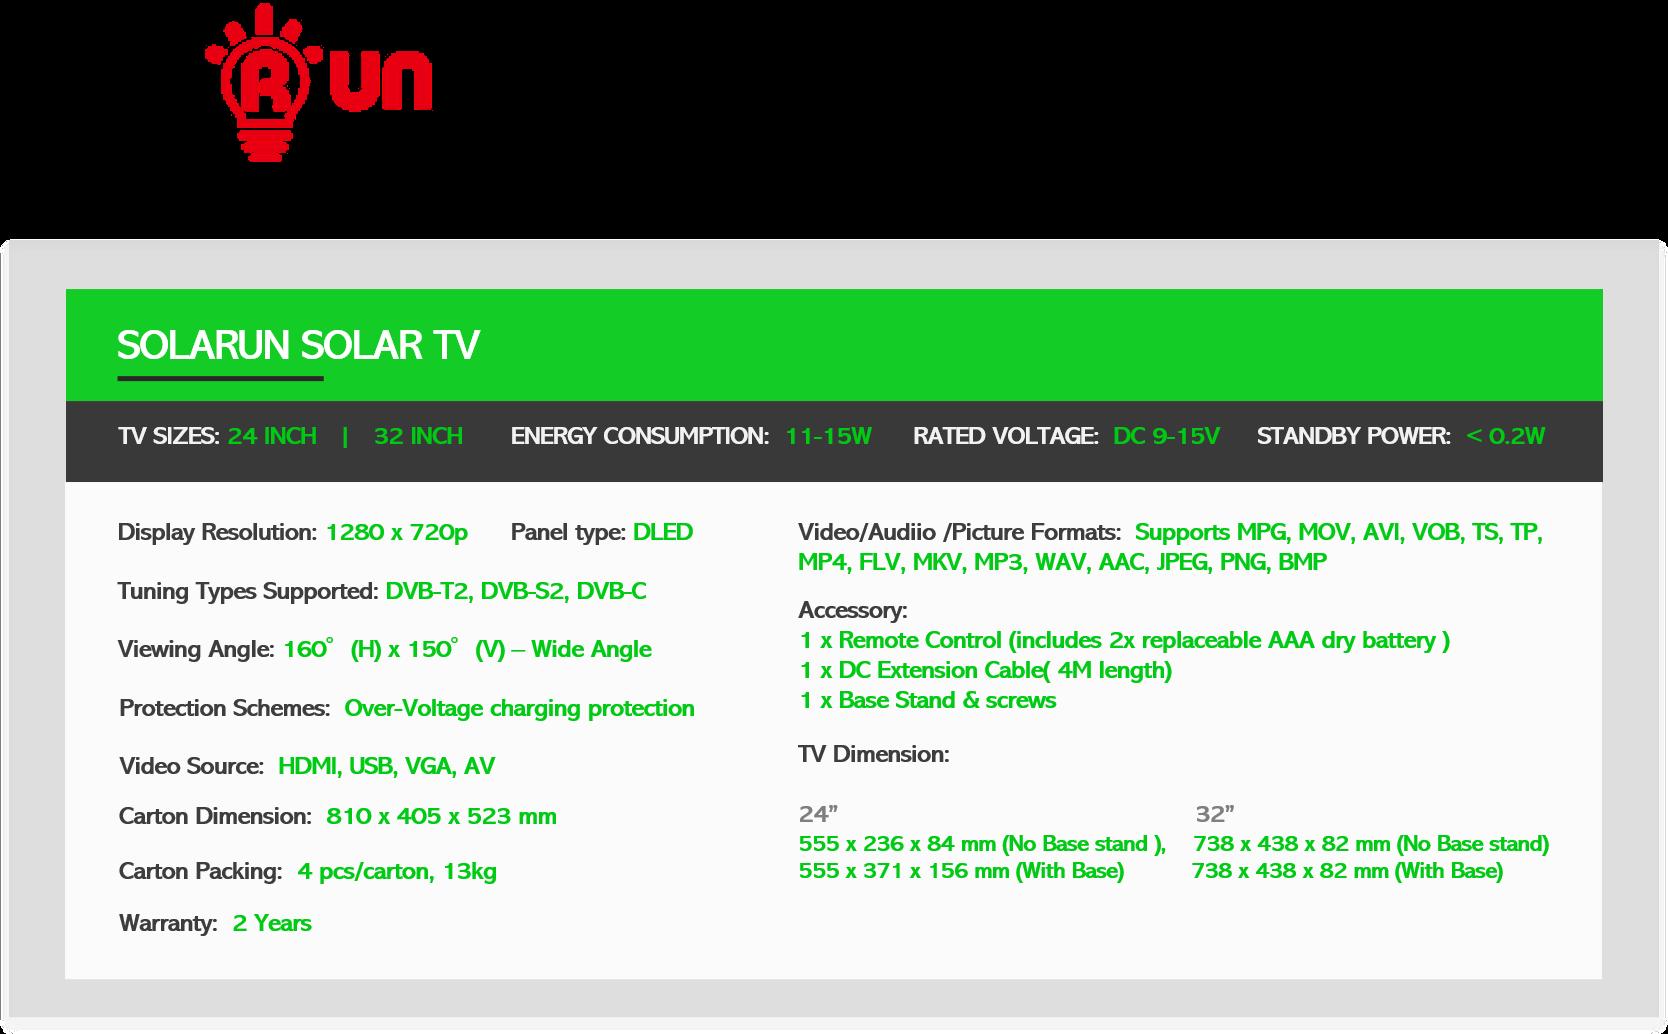 SOLARUN SOLAR TV Spec Table